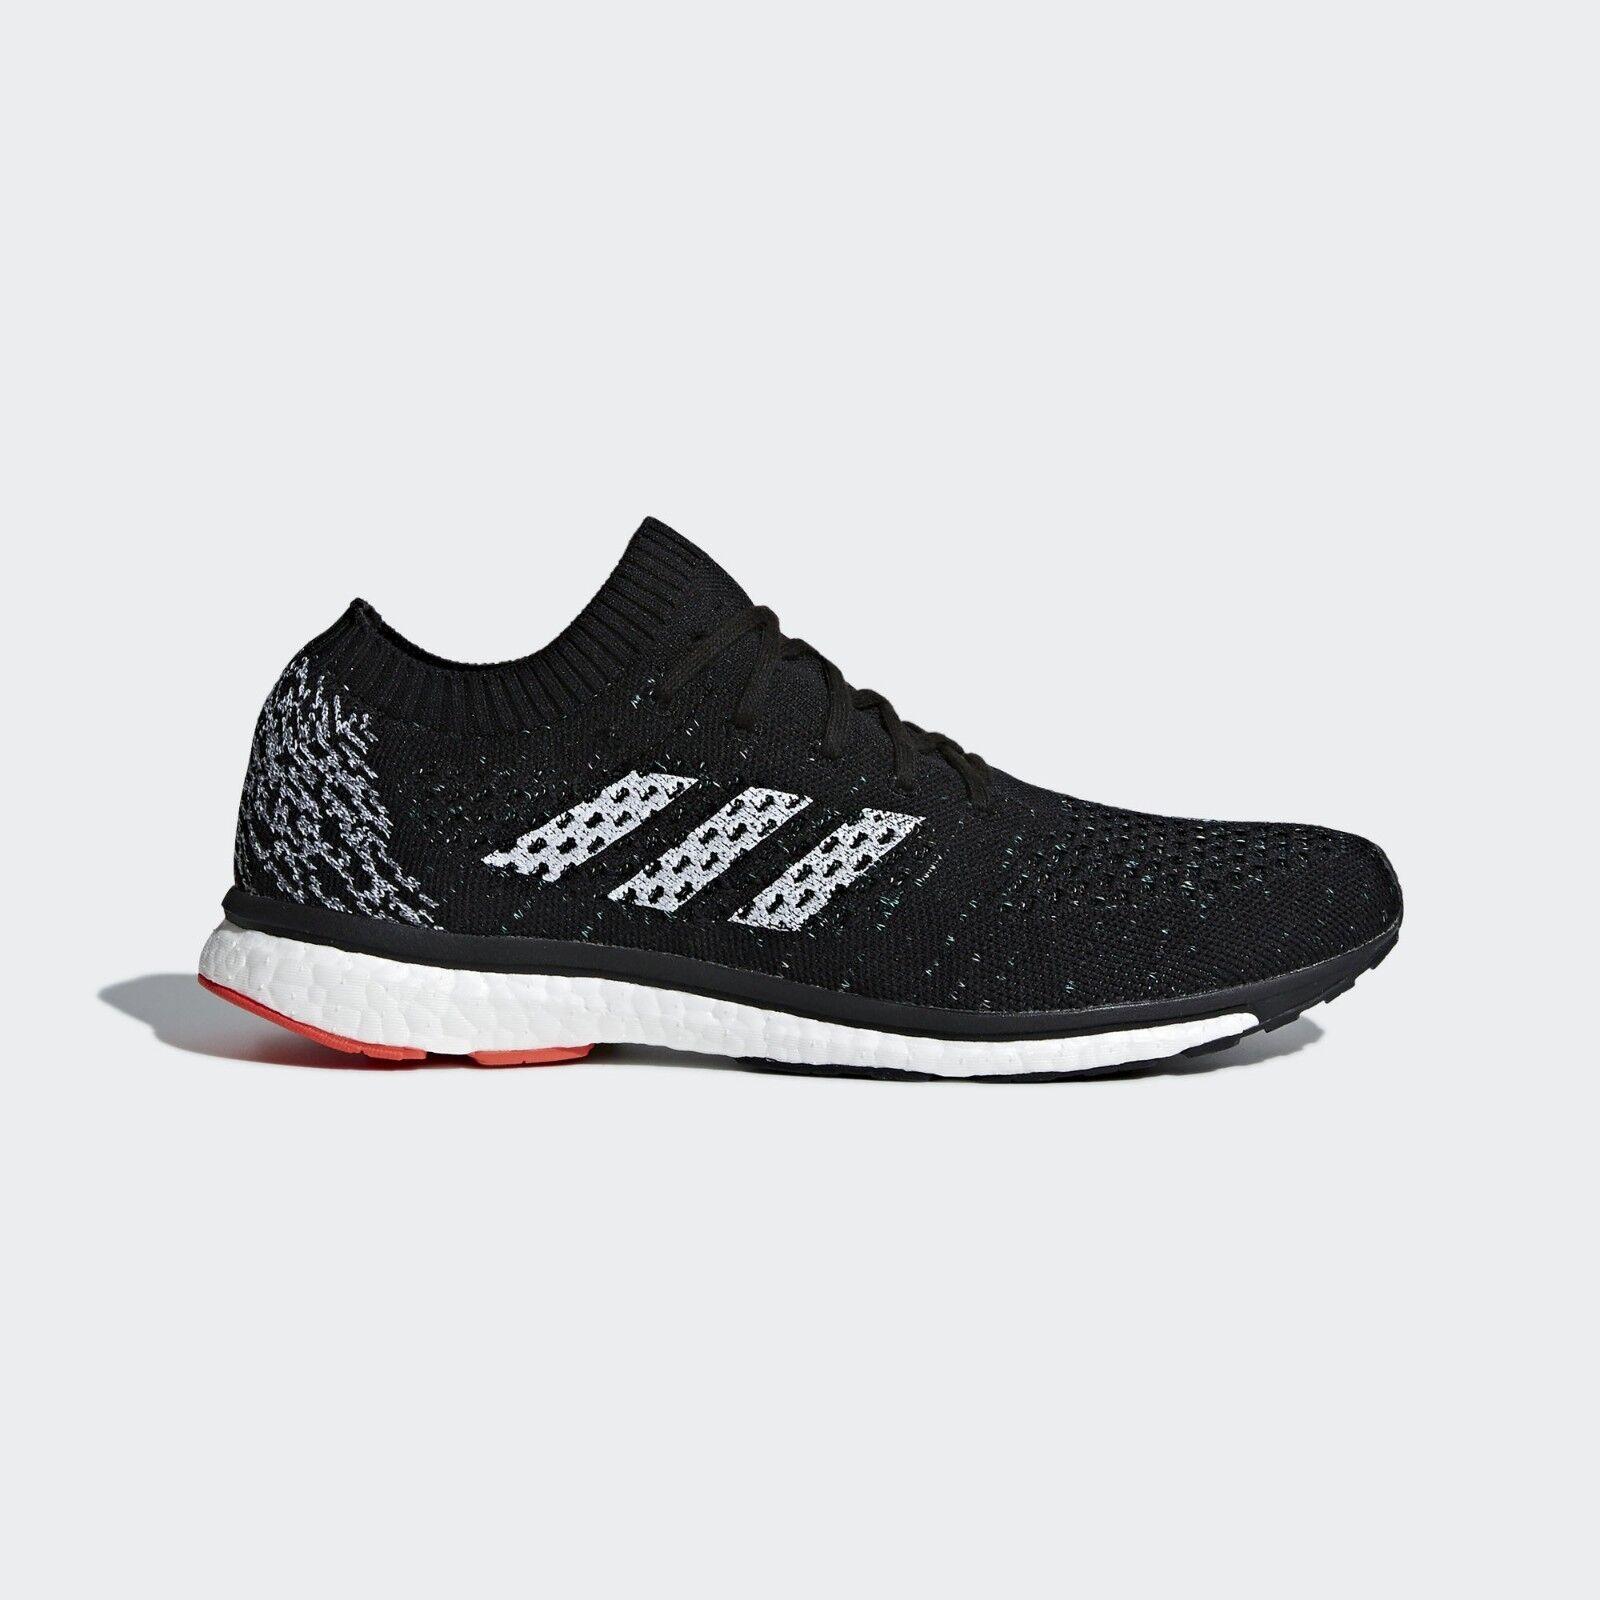 0e0cca36 Adidas Adizero Prime LTD hombres Zapatos para Correr-Negro blancoo gris  CP8922 BOOST Para ntytjx1132-Zapatillas deportivas